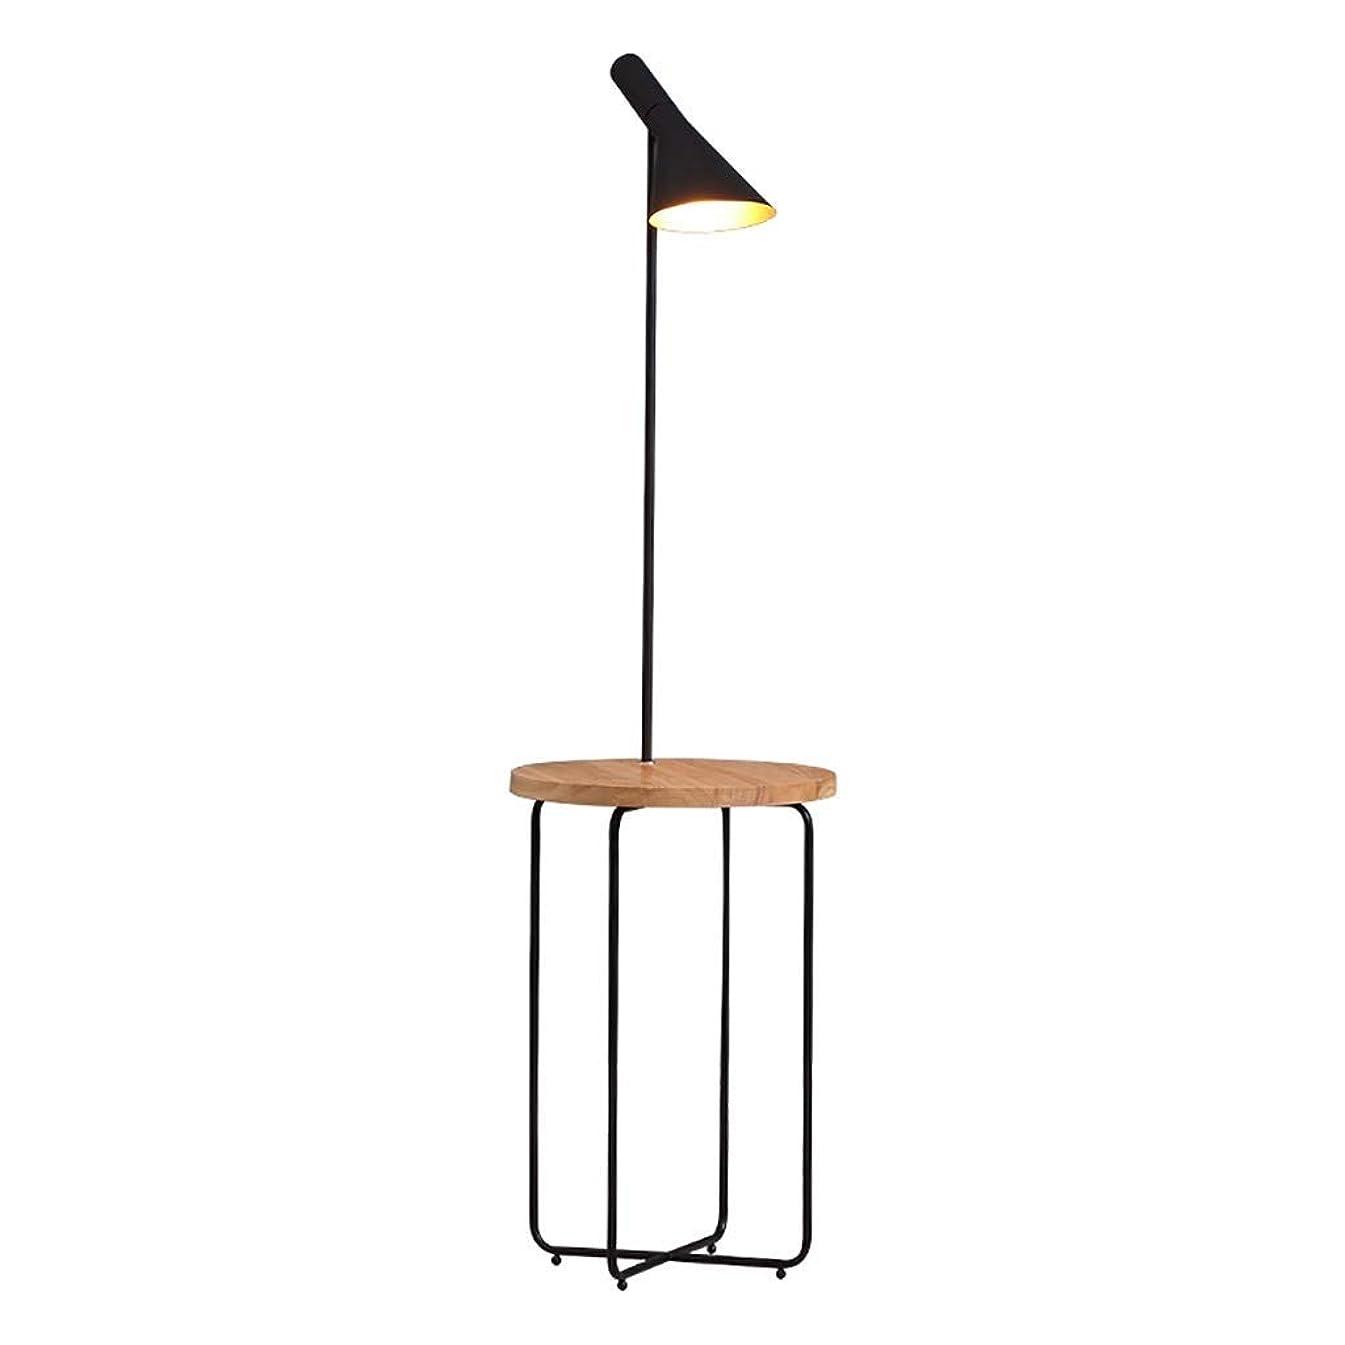 AJZGFClassic Floor lamp Floor lamp Modern Table lamp, Sofa Bedroom Bedside Table Storage Floor lamp Indoor Lighting